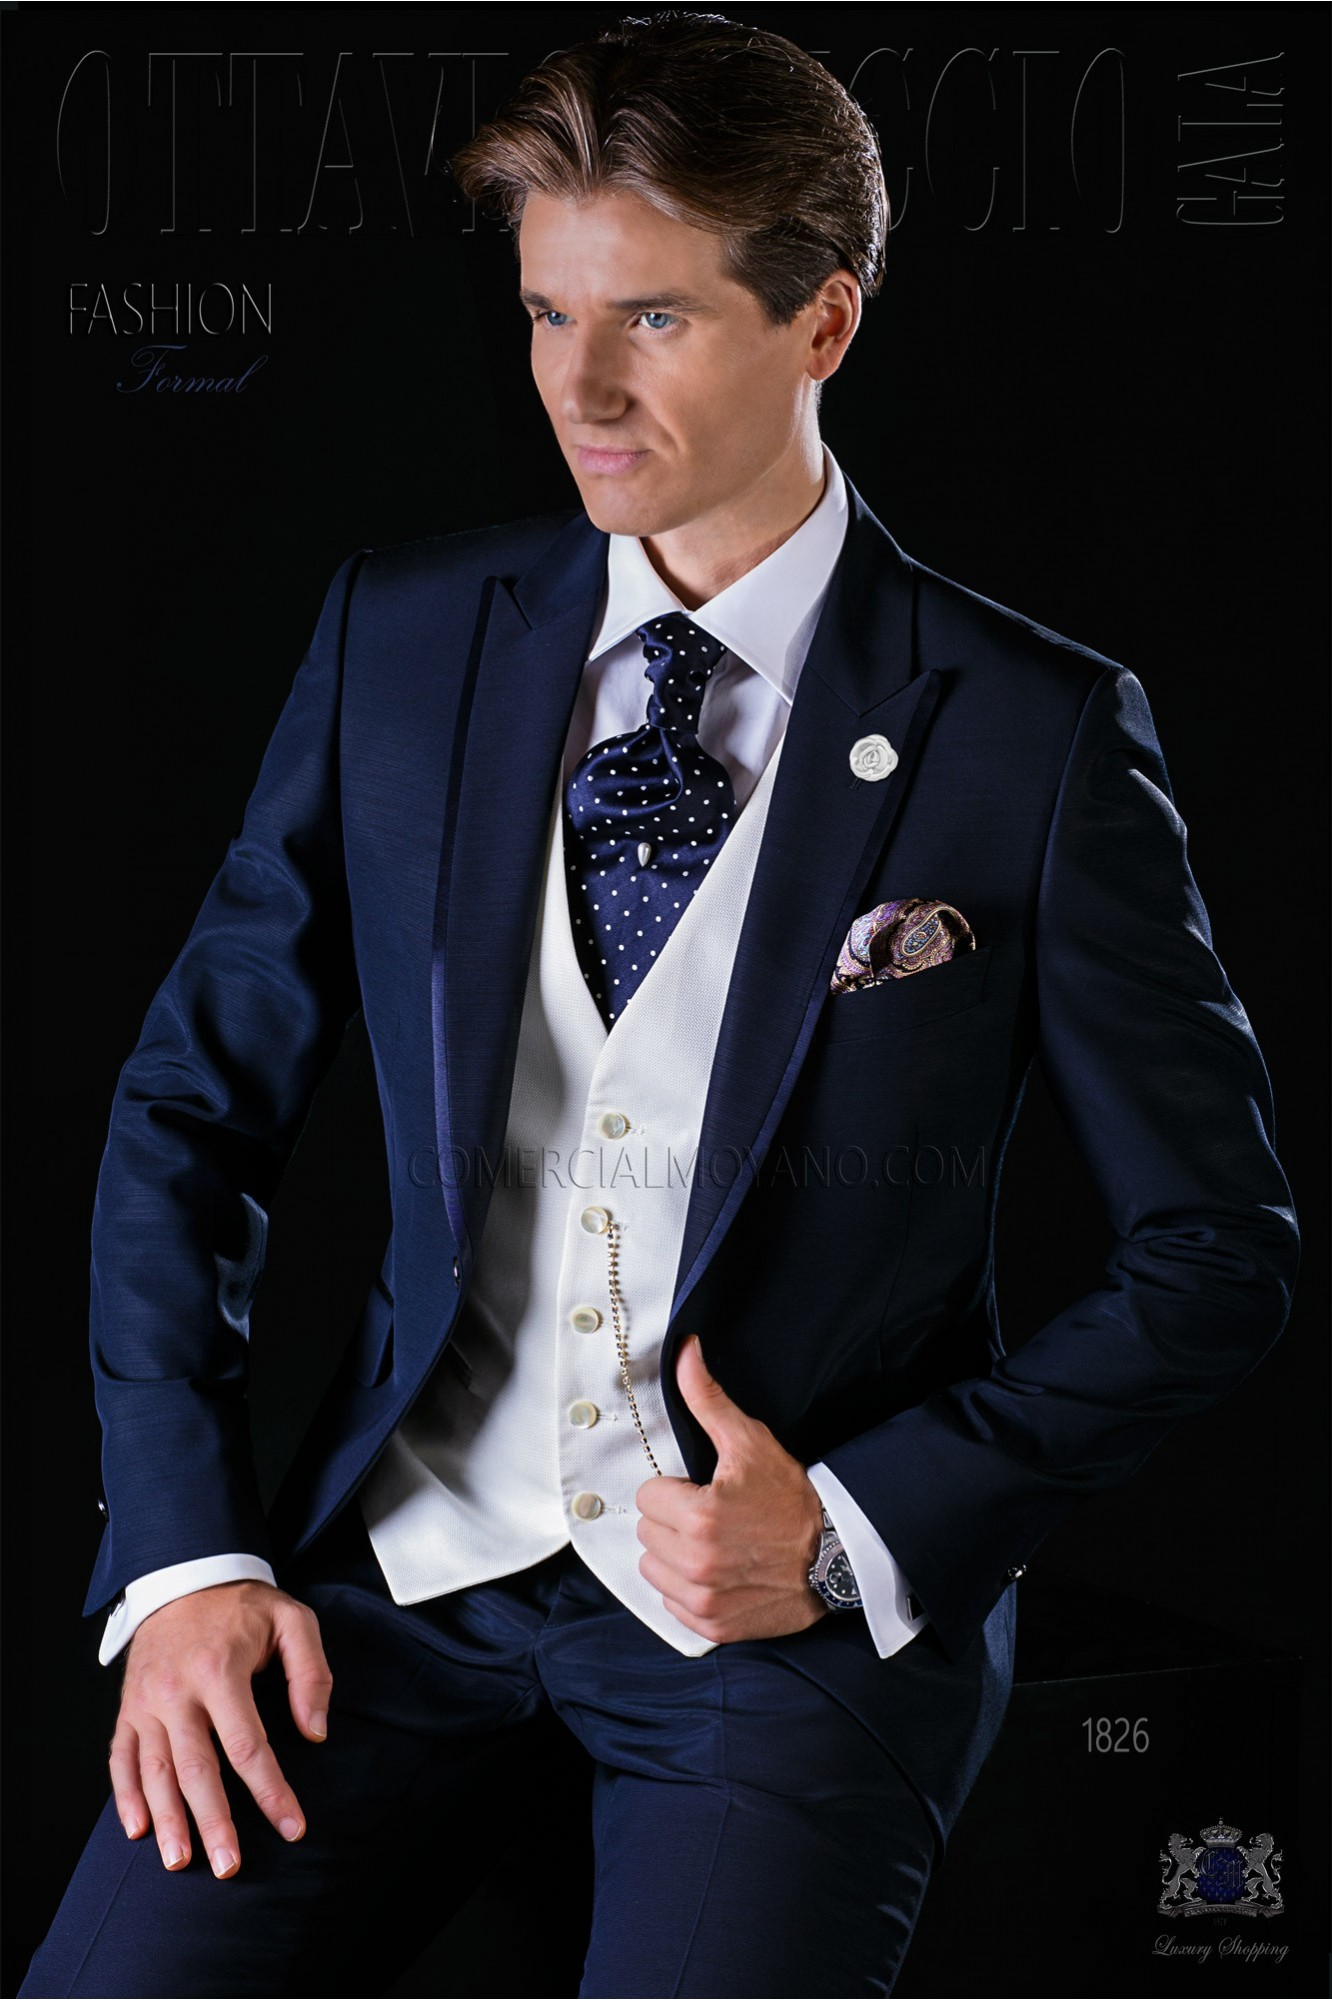 Traje de novio slim azul con vivos de raso modelo: 1826 Ottavio Nuccio Gala colección Fashion